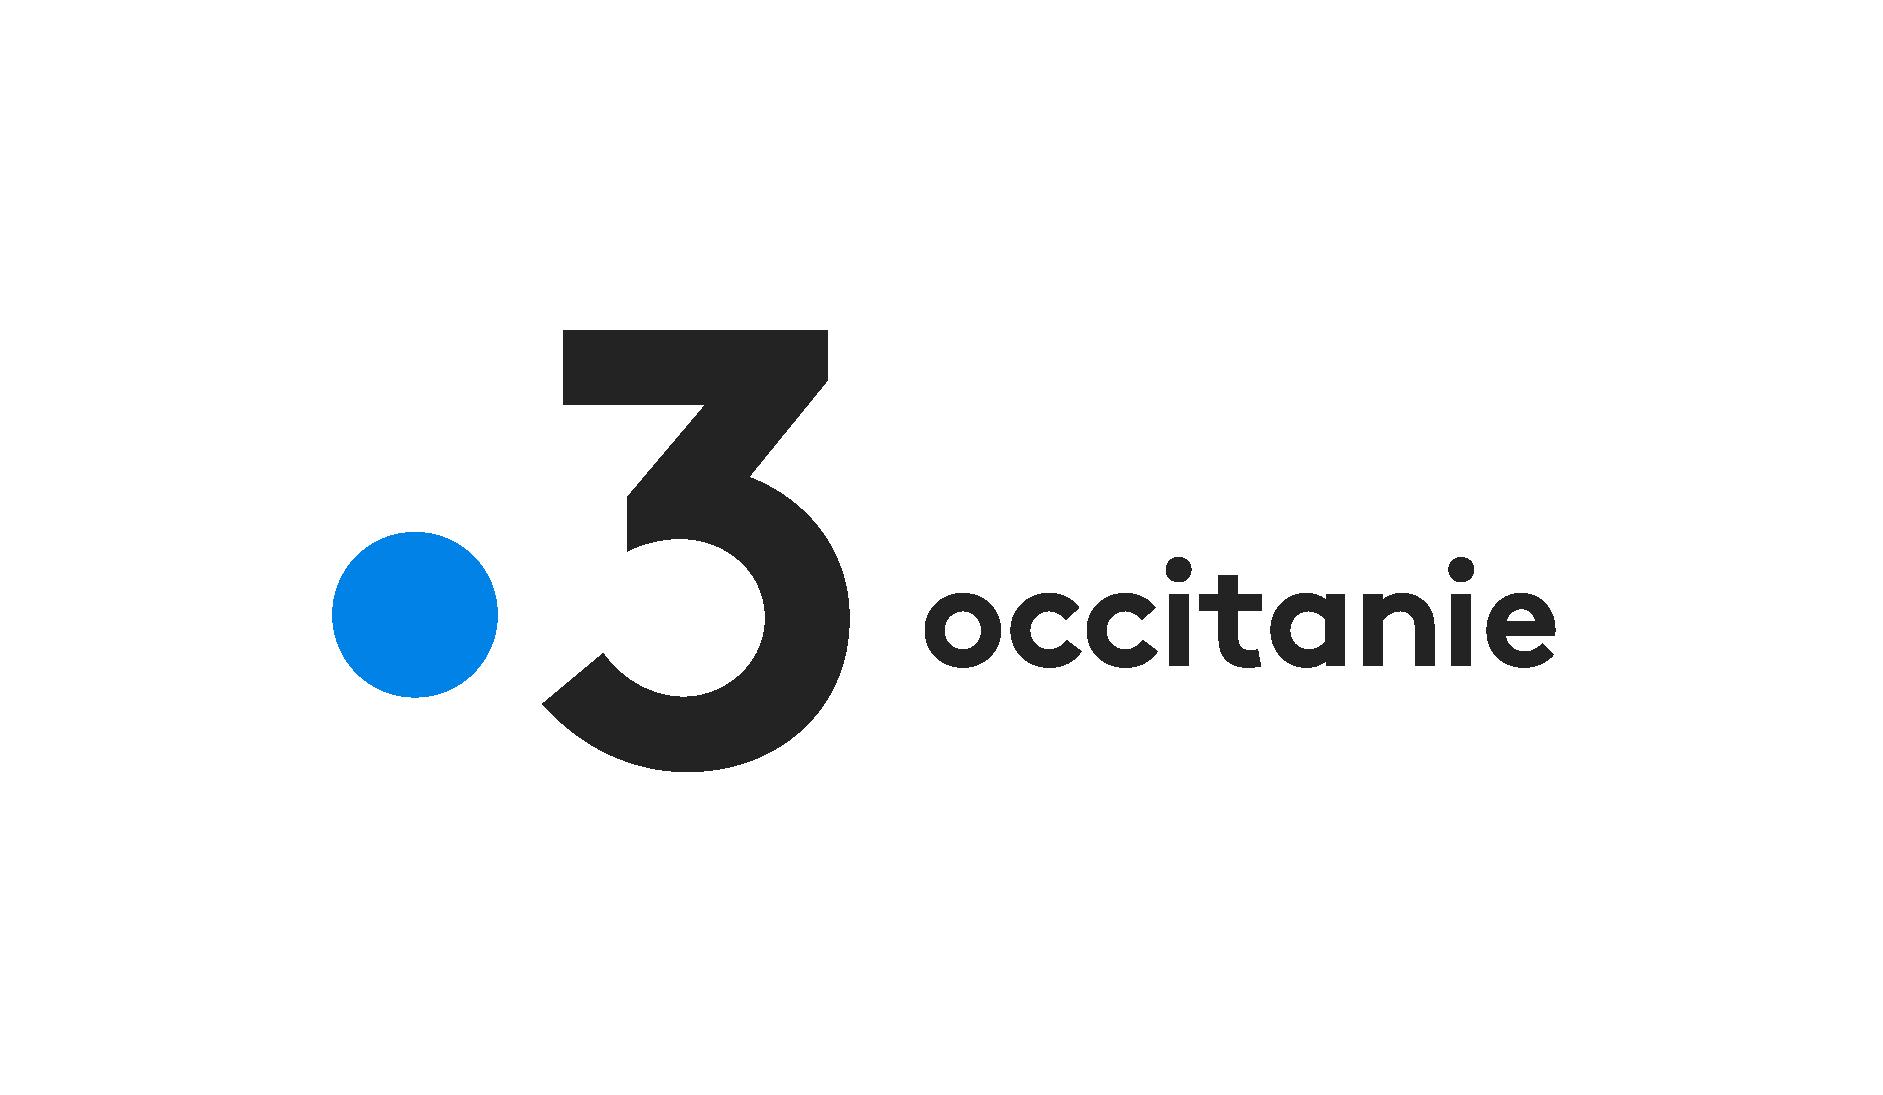 france_3_logo_rvb_occitanie_couleur_noir